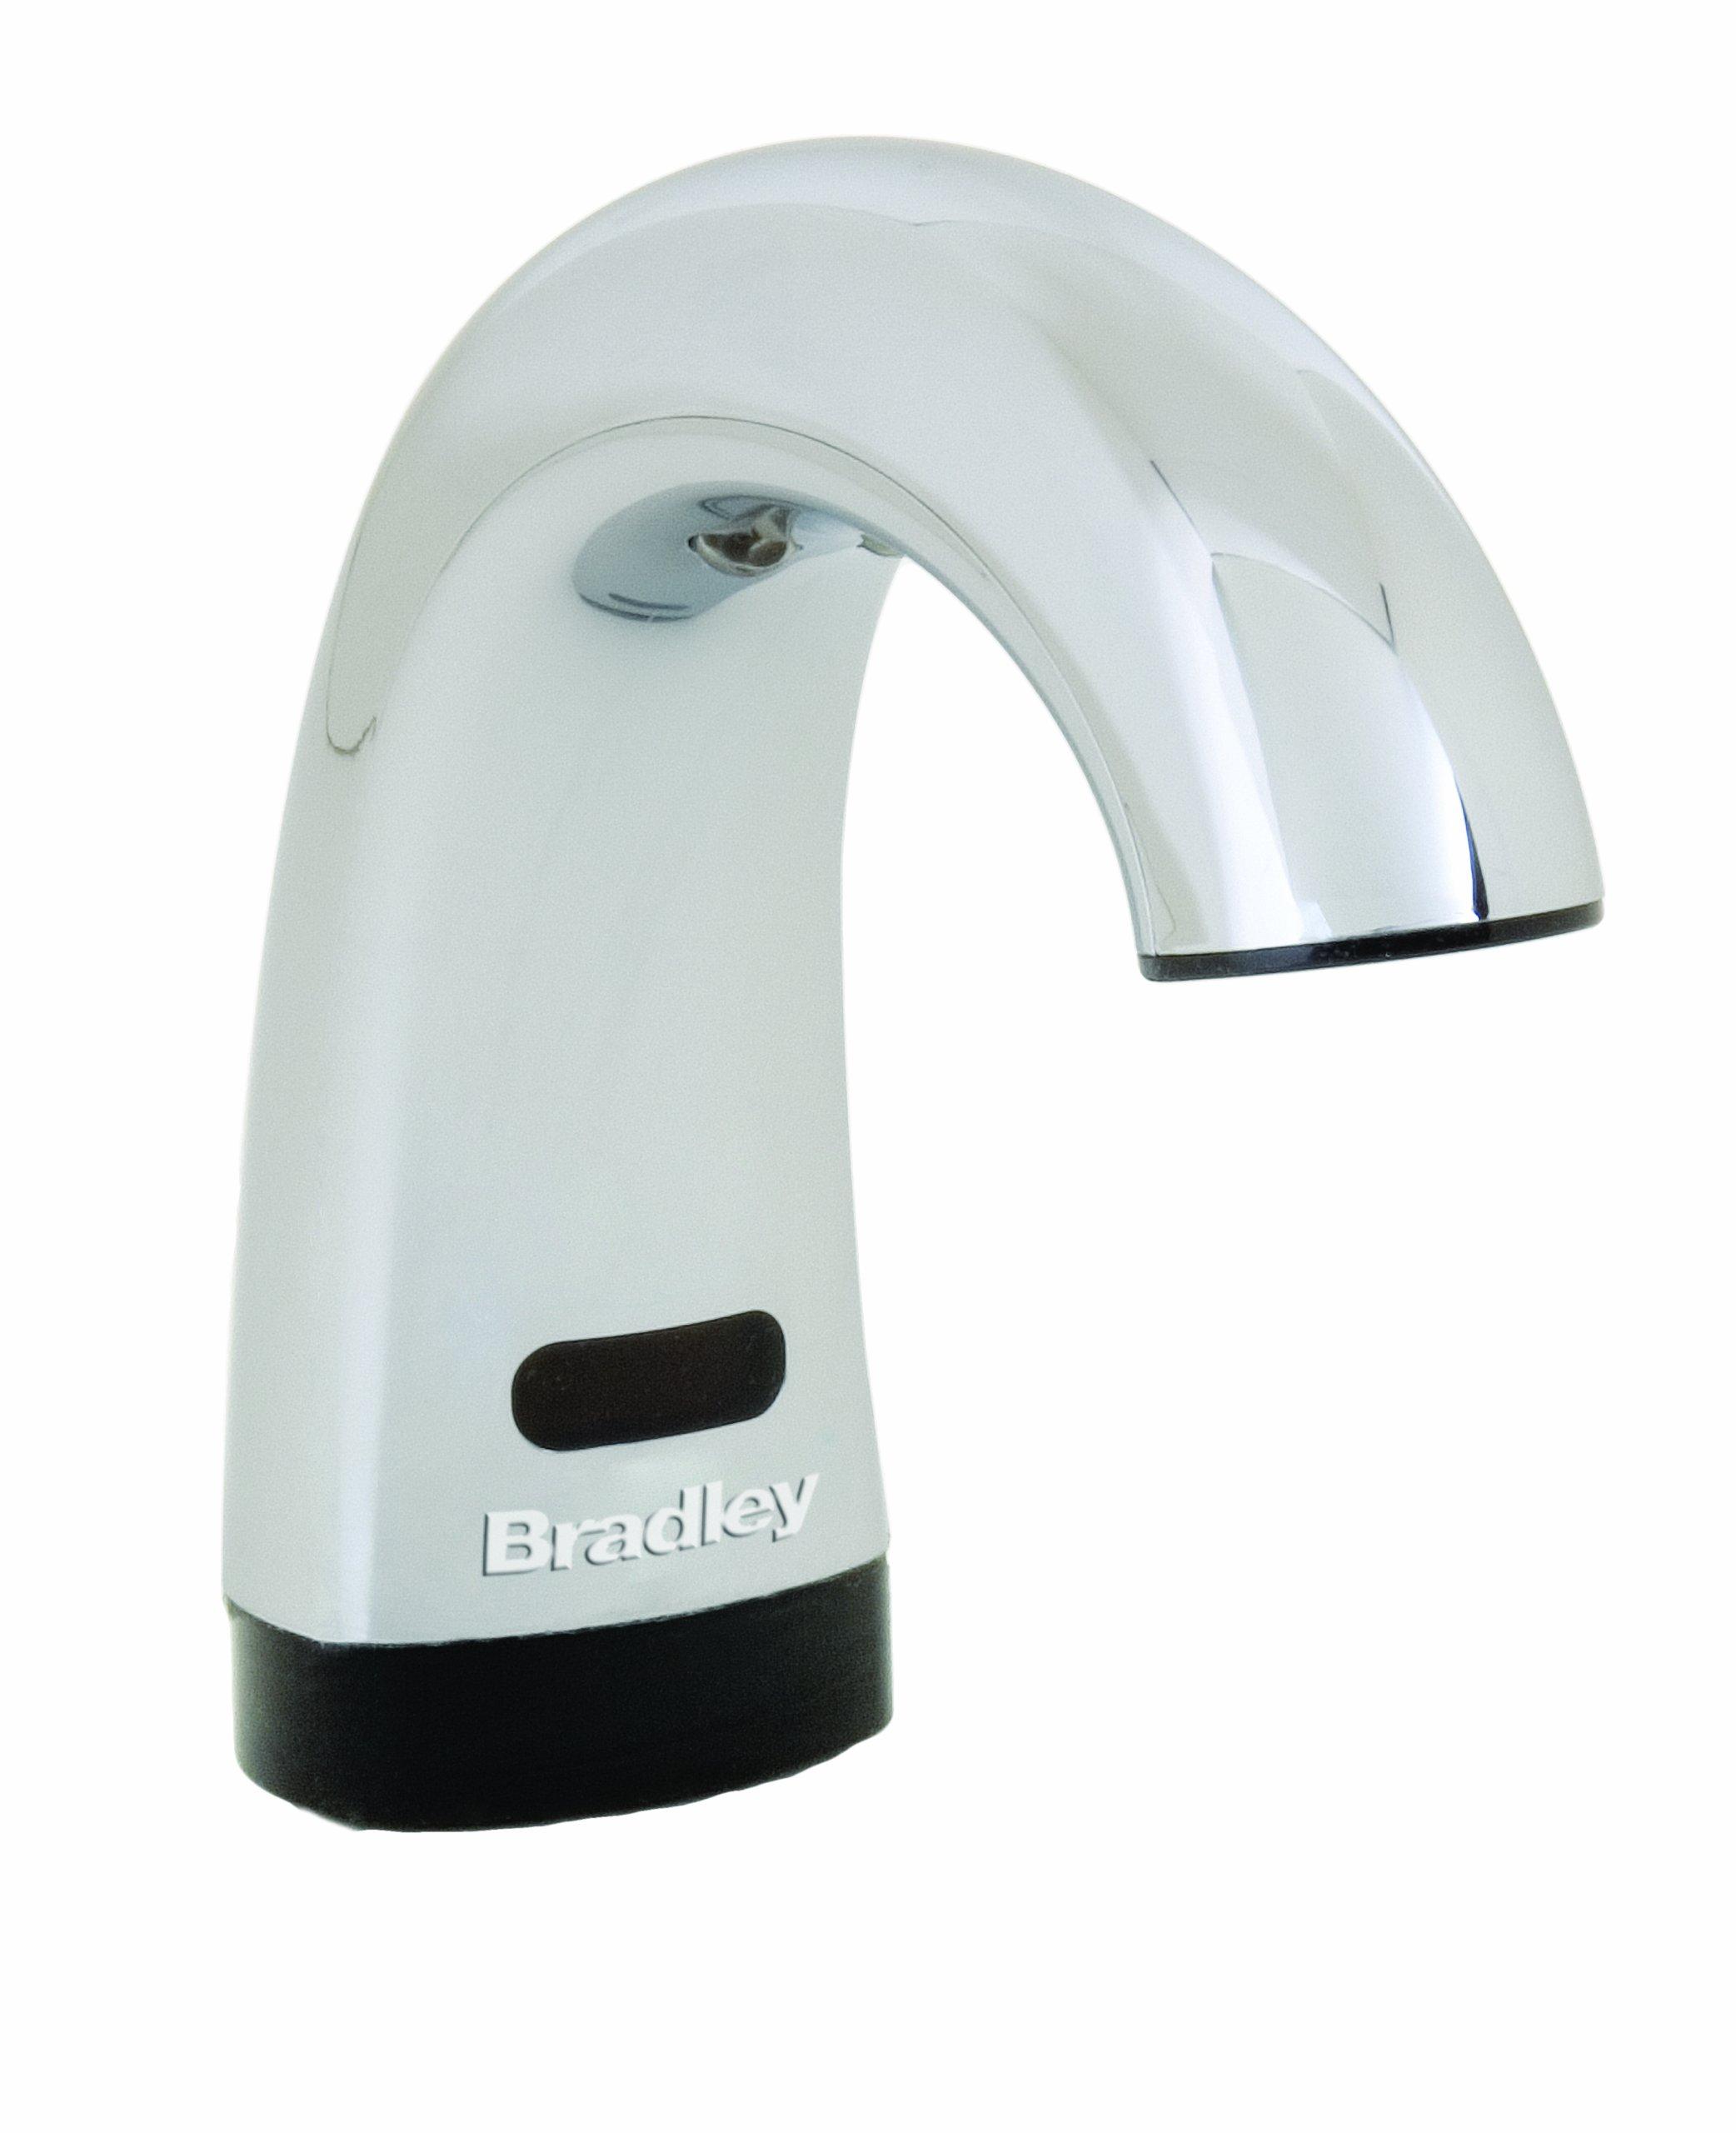 Bradley 6315-000000 Lavatory Mounted Sensored Soap Dispenser, 27 oz. Capacity, 5-1/2'' Spout by Bradley